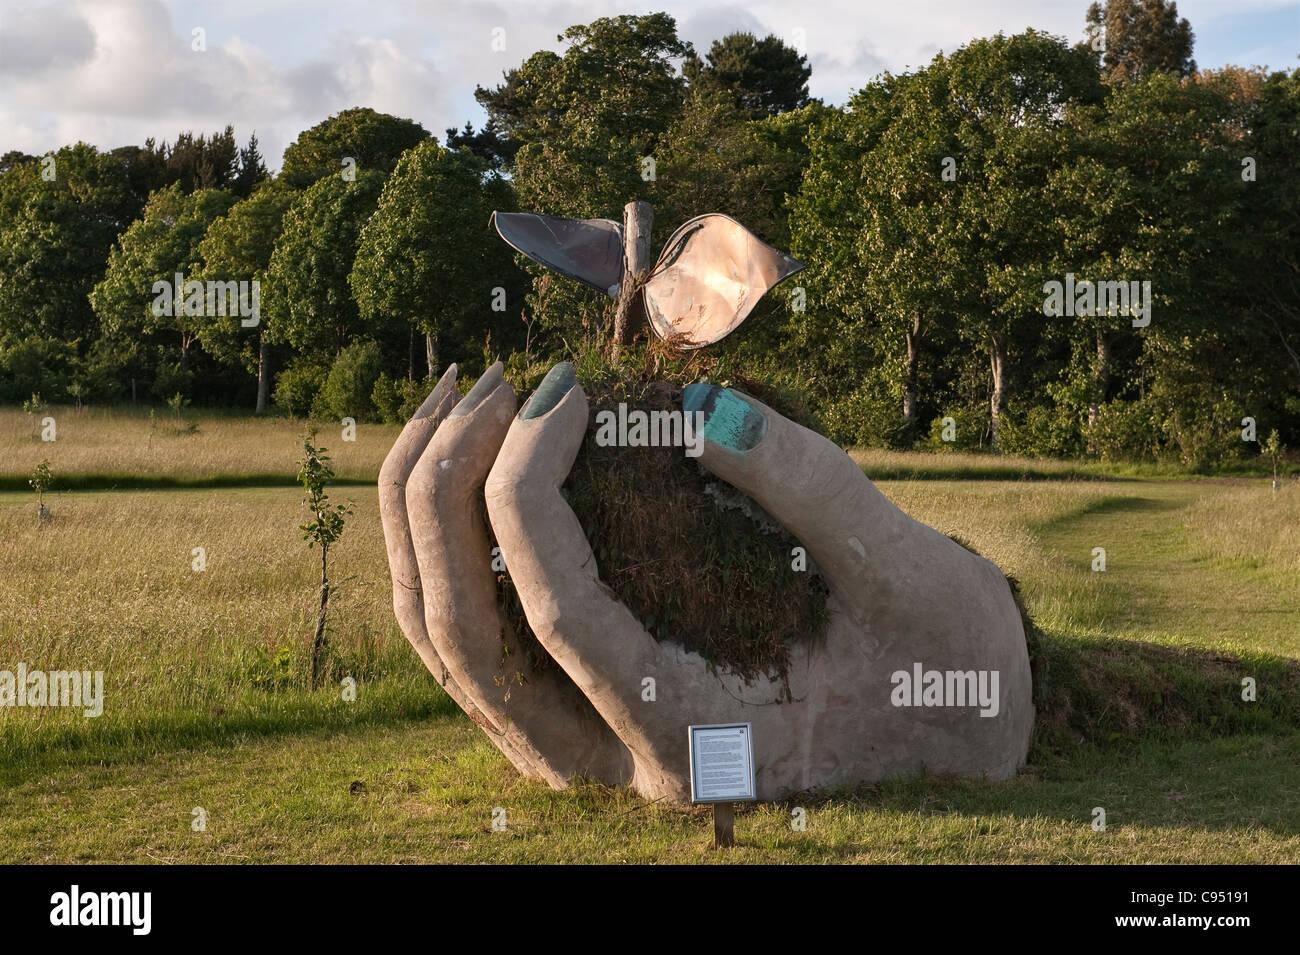 "Cotehele, Cornwall, UK. Skulptur von Brendan Murless im 'Mutter Obstgarten""enthält seltene lokale Stockbild"